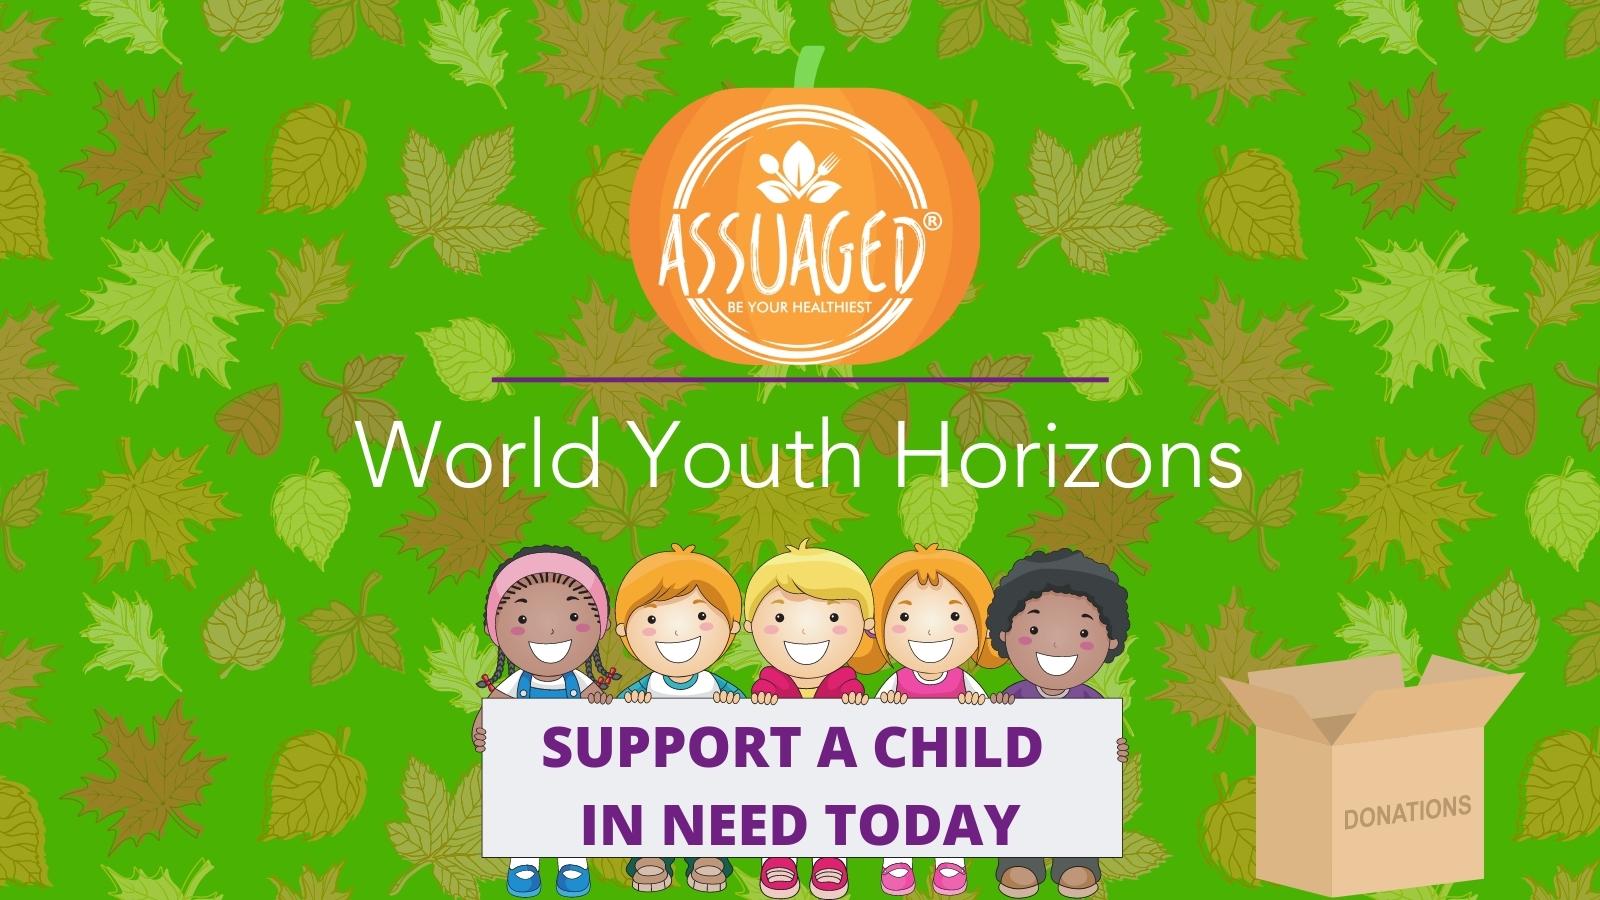 Assuaged-World-Youth-Horizons-Twitter-October-Halloween